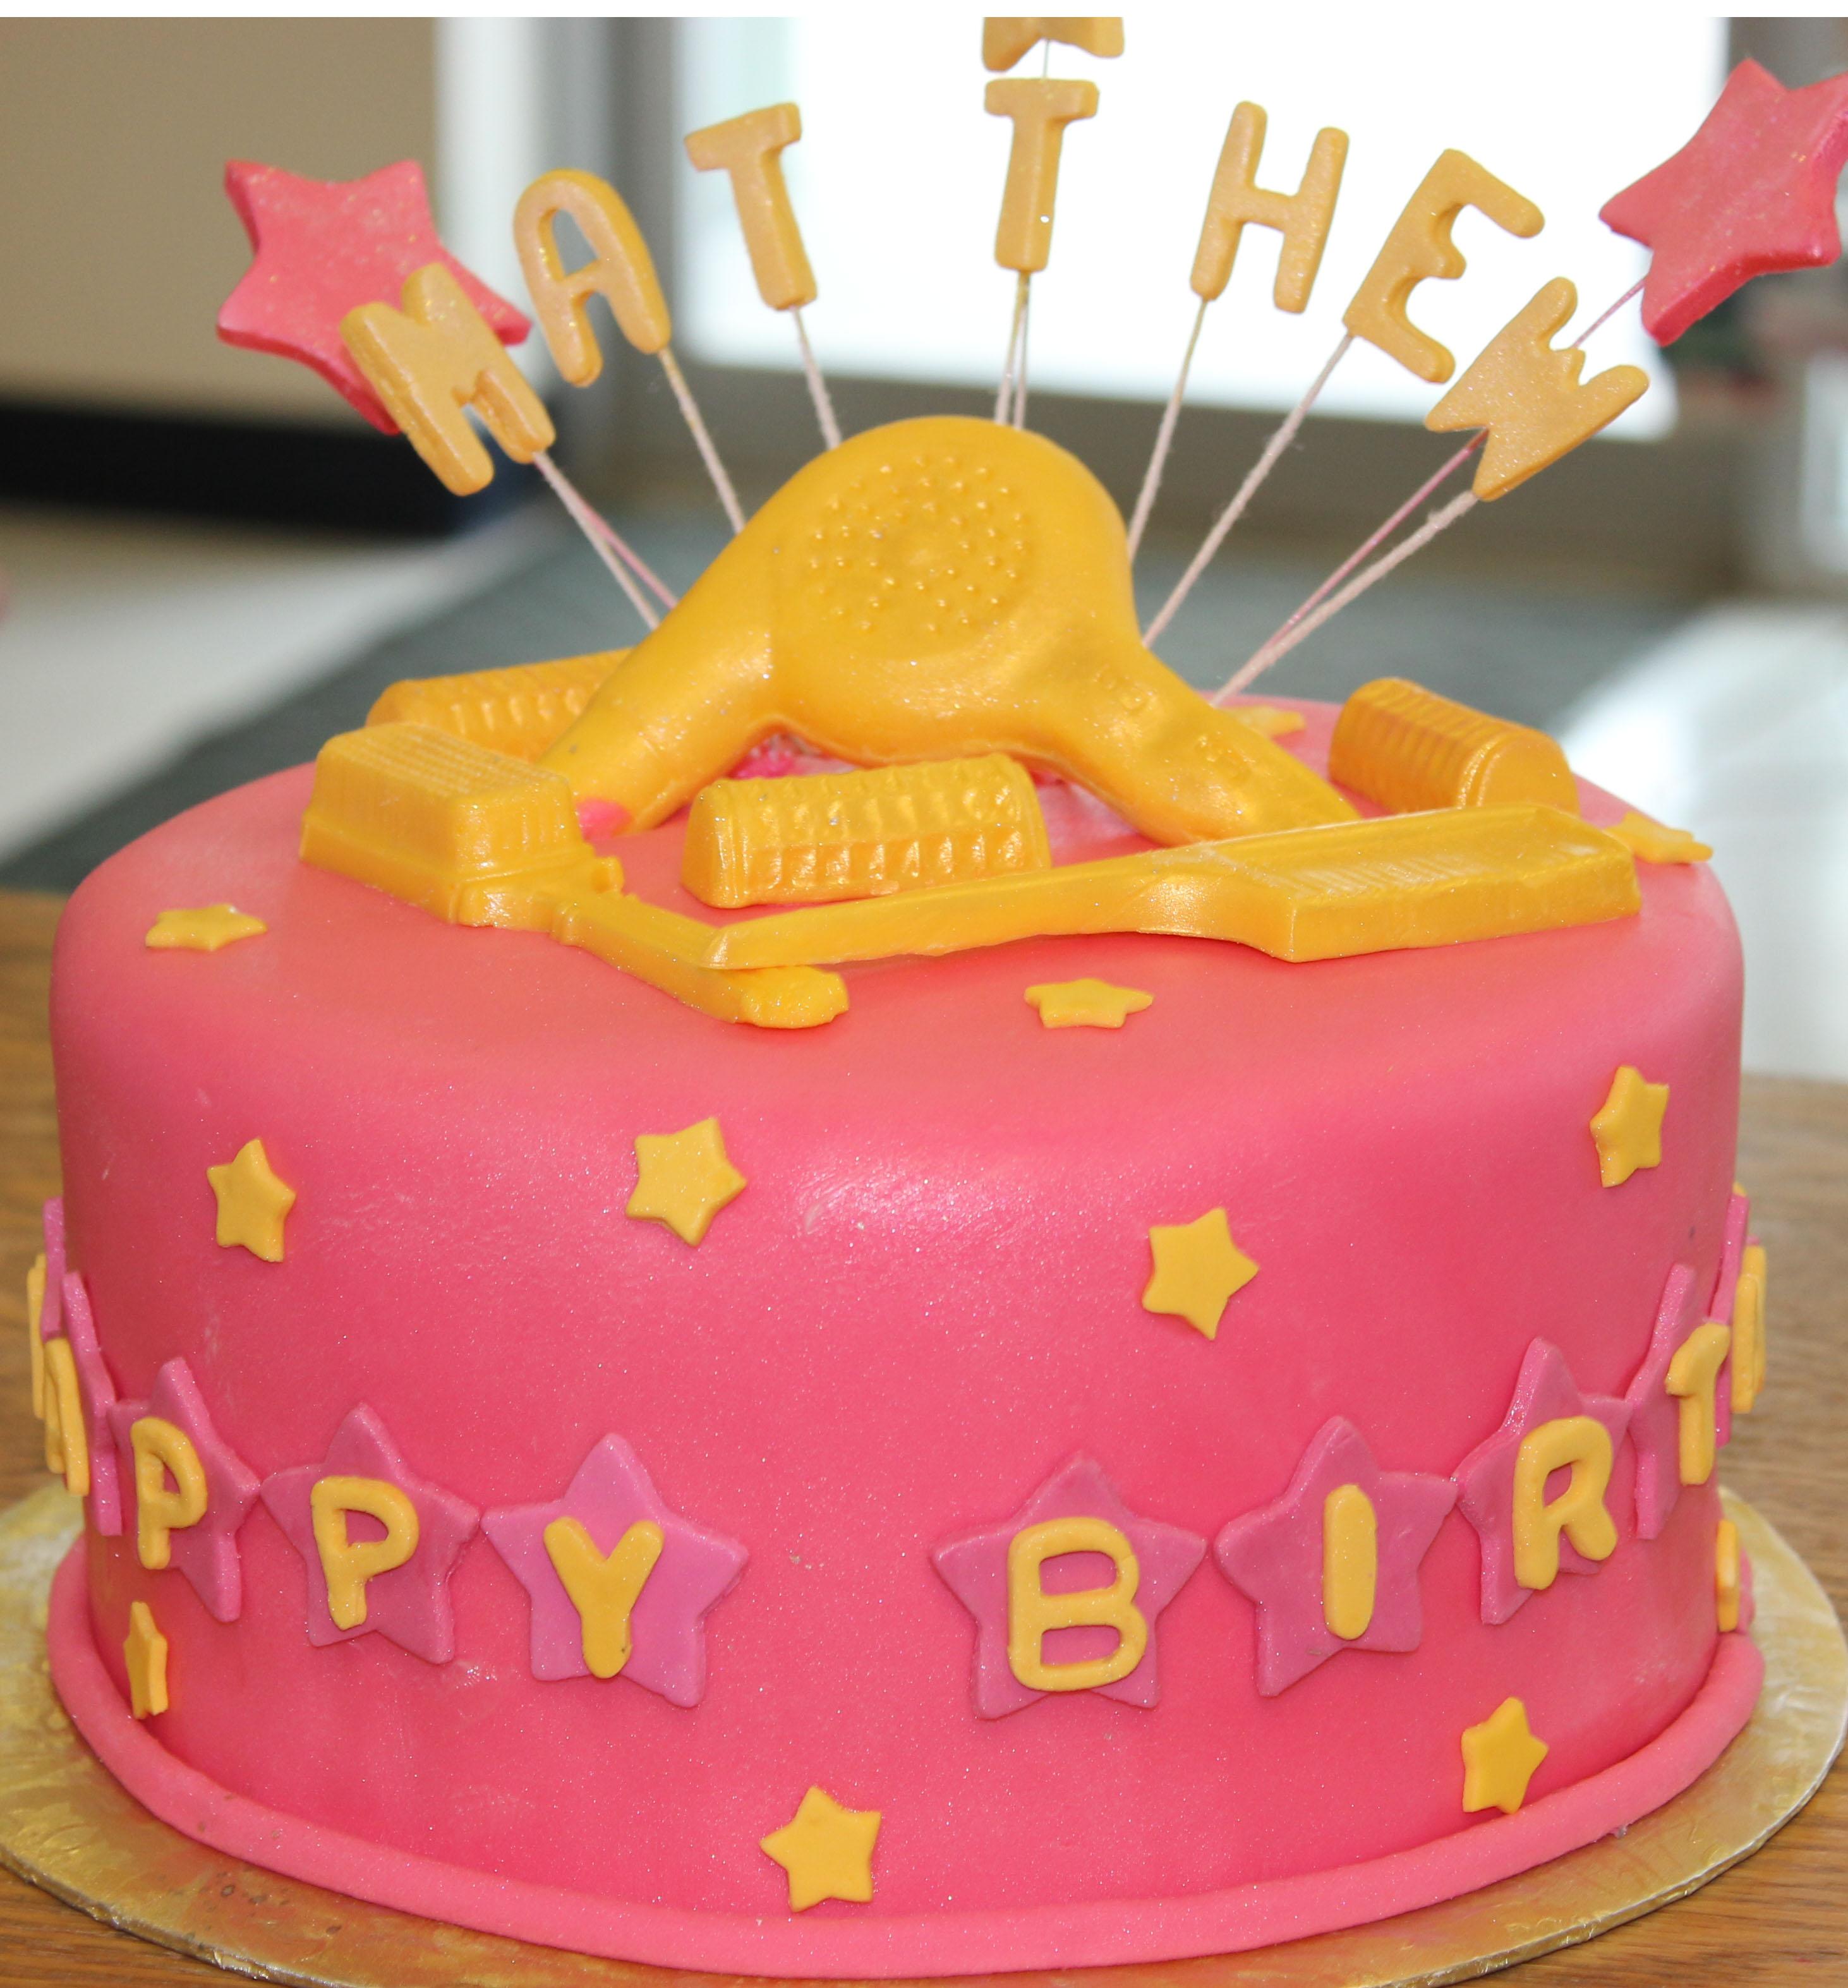 Matthews Pink Fondant Cake Lolita by Lolita